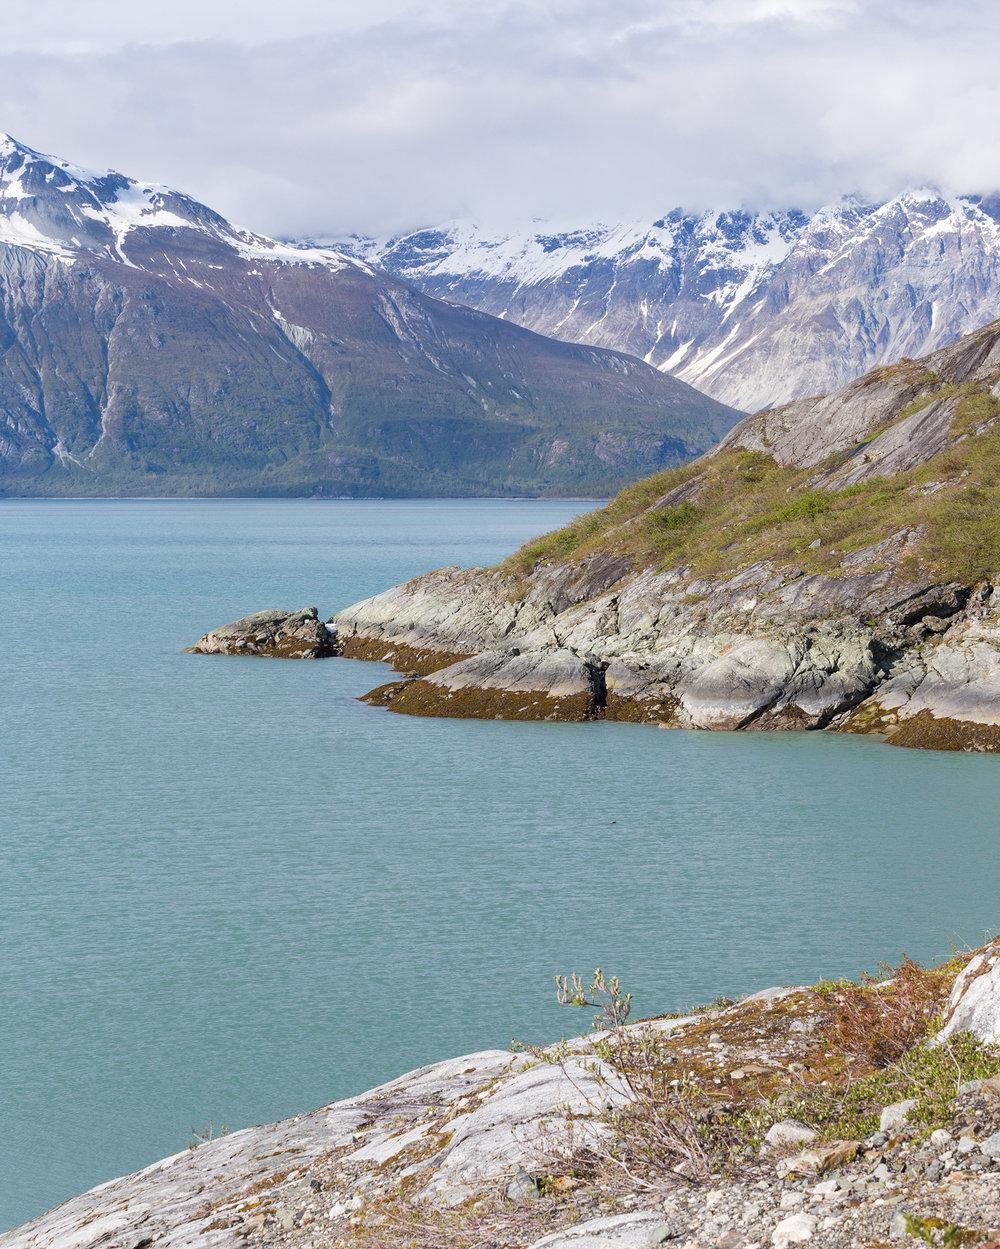 Glacier Bay National Park West Arm Kayaking Camping Trip-52.jpg